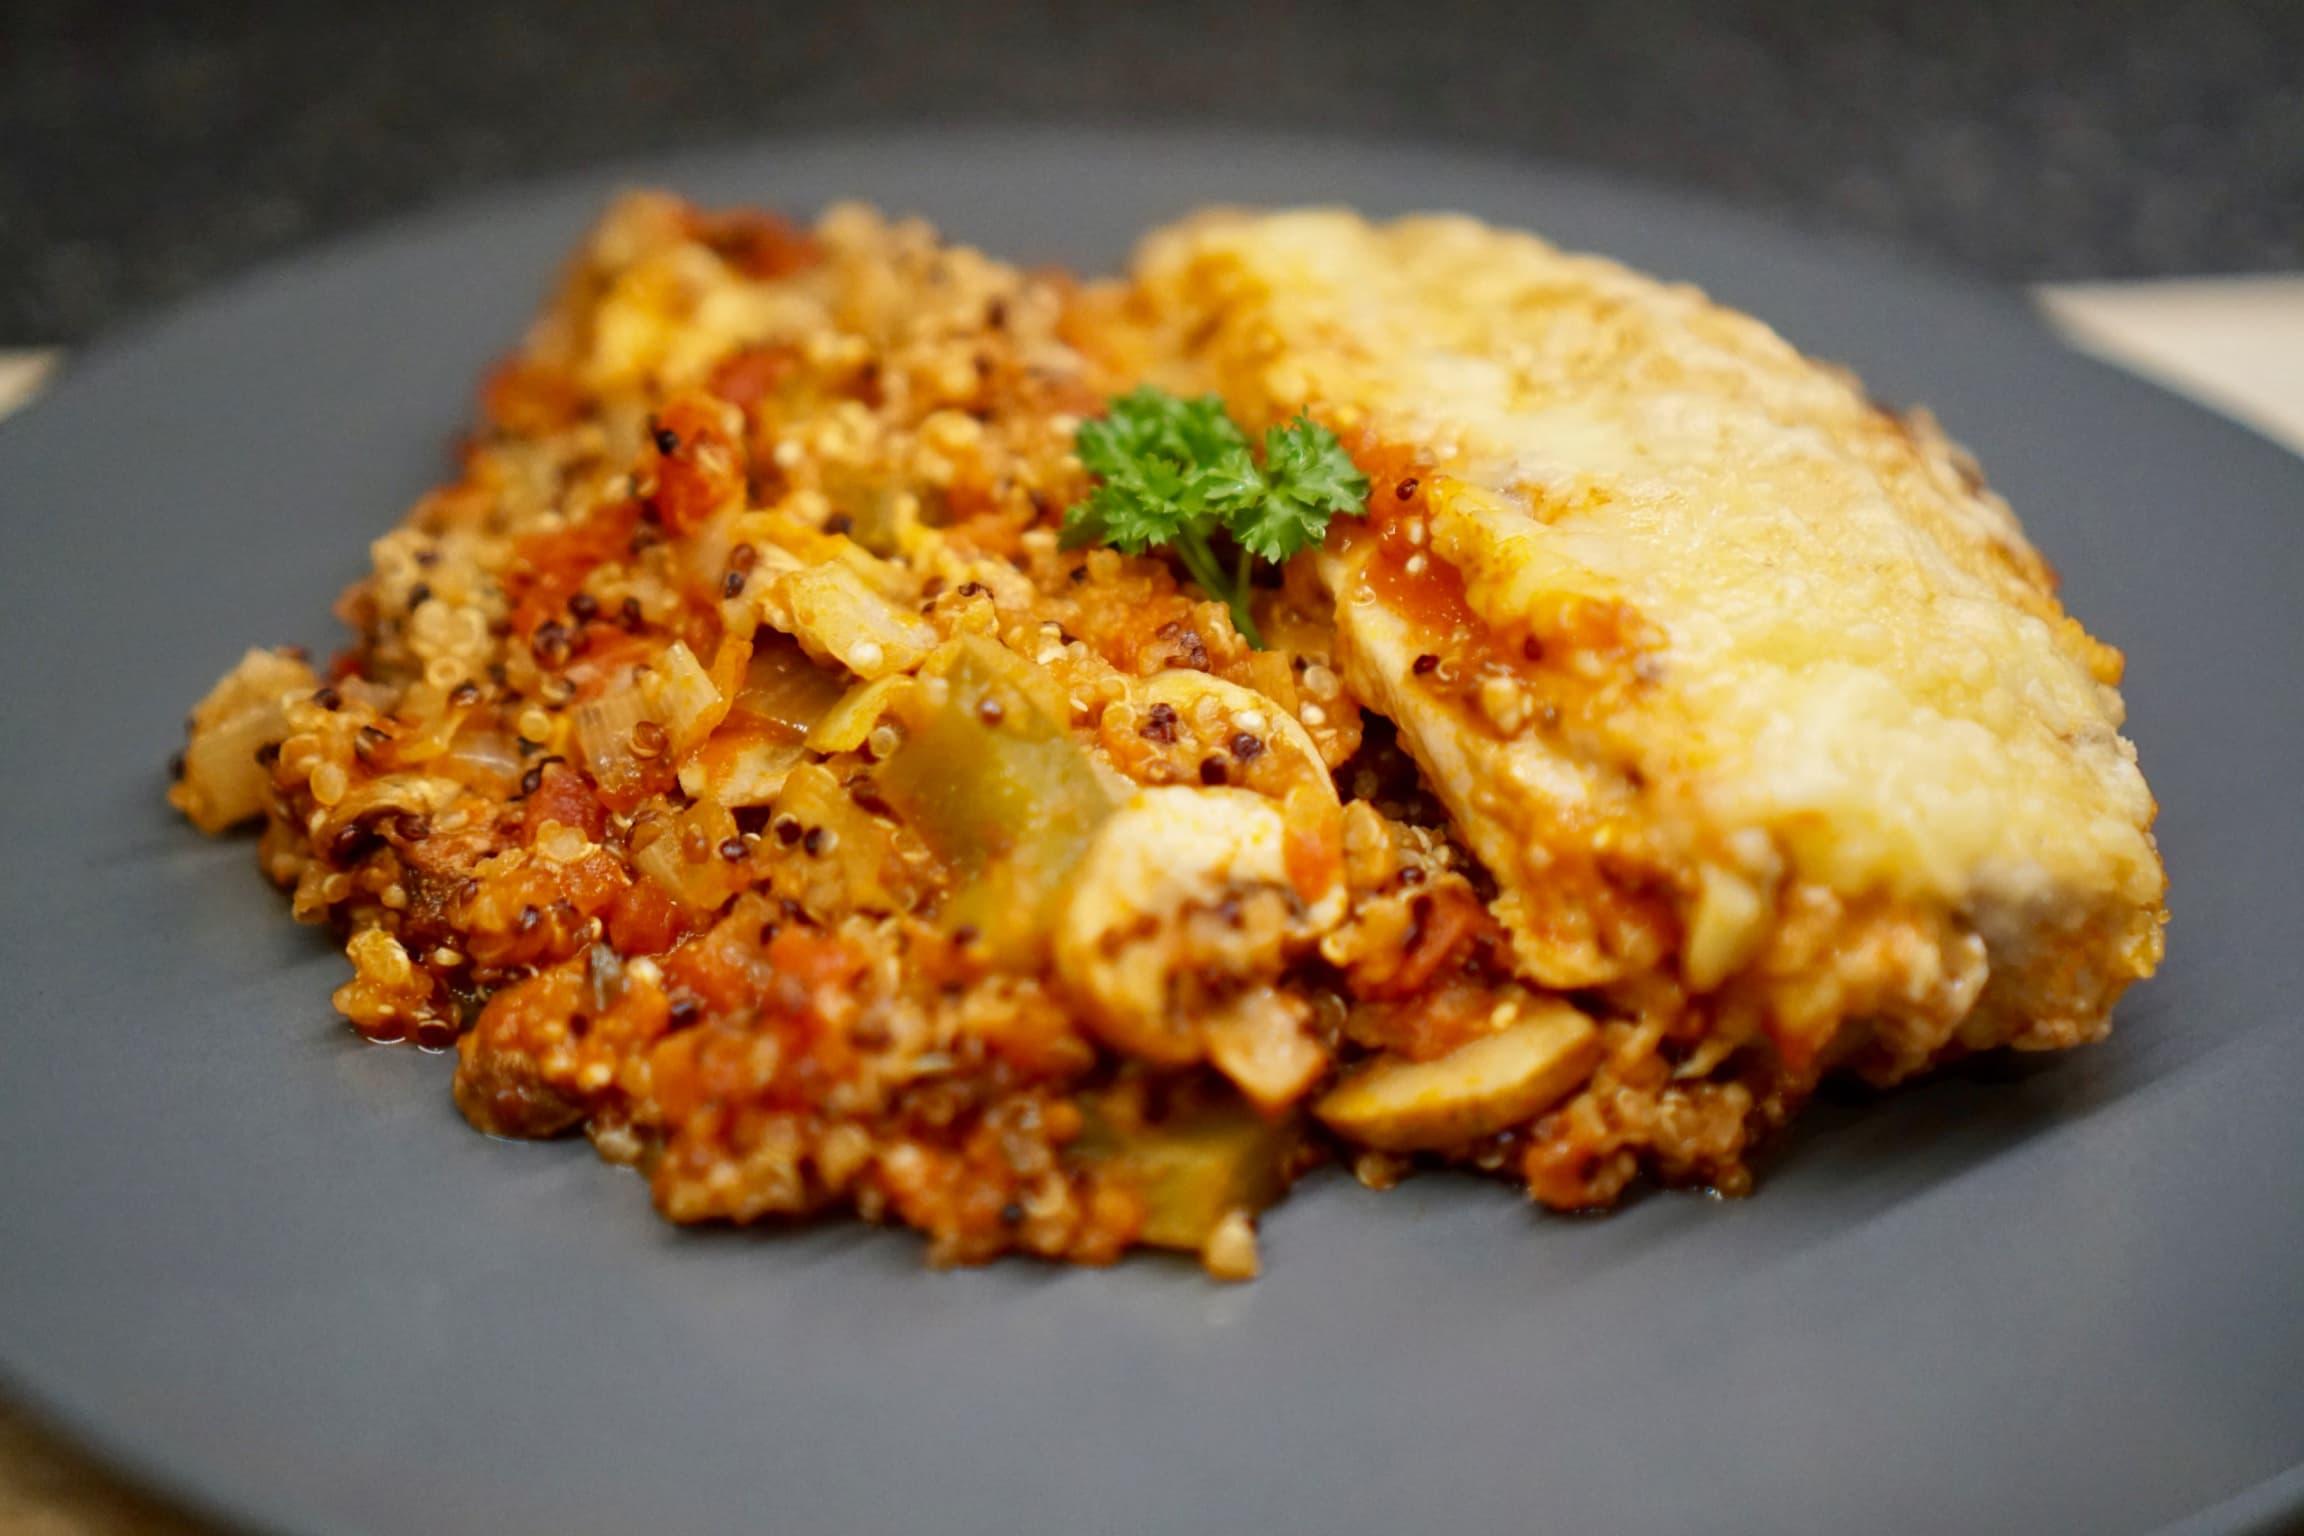 Parmesan Chicken and Quinoa